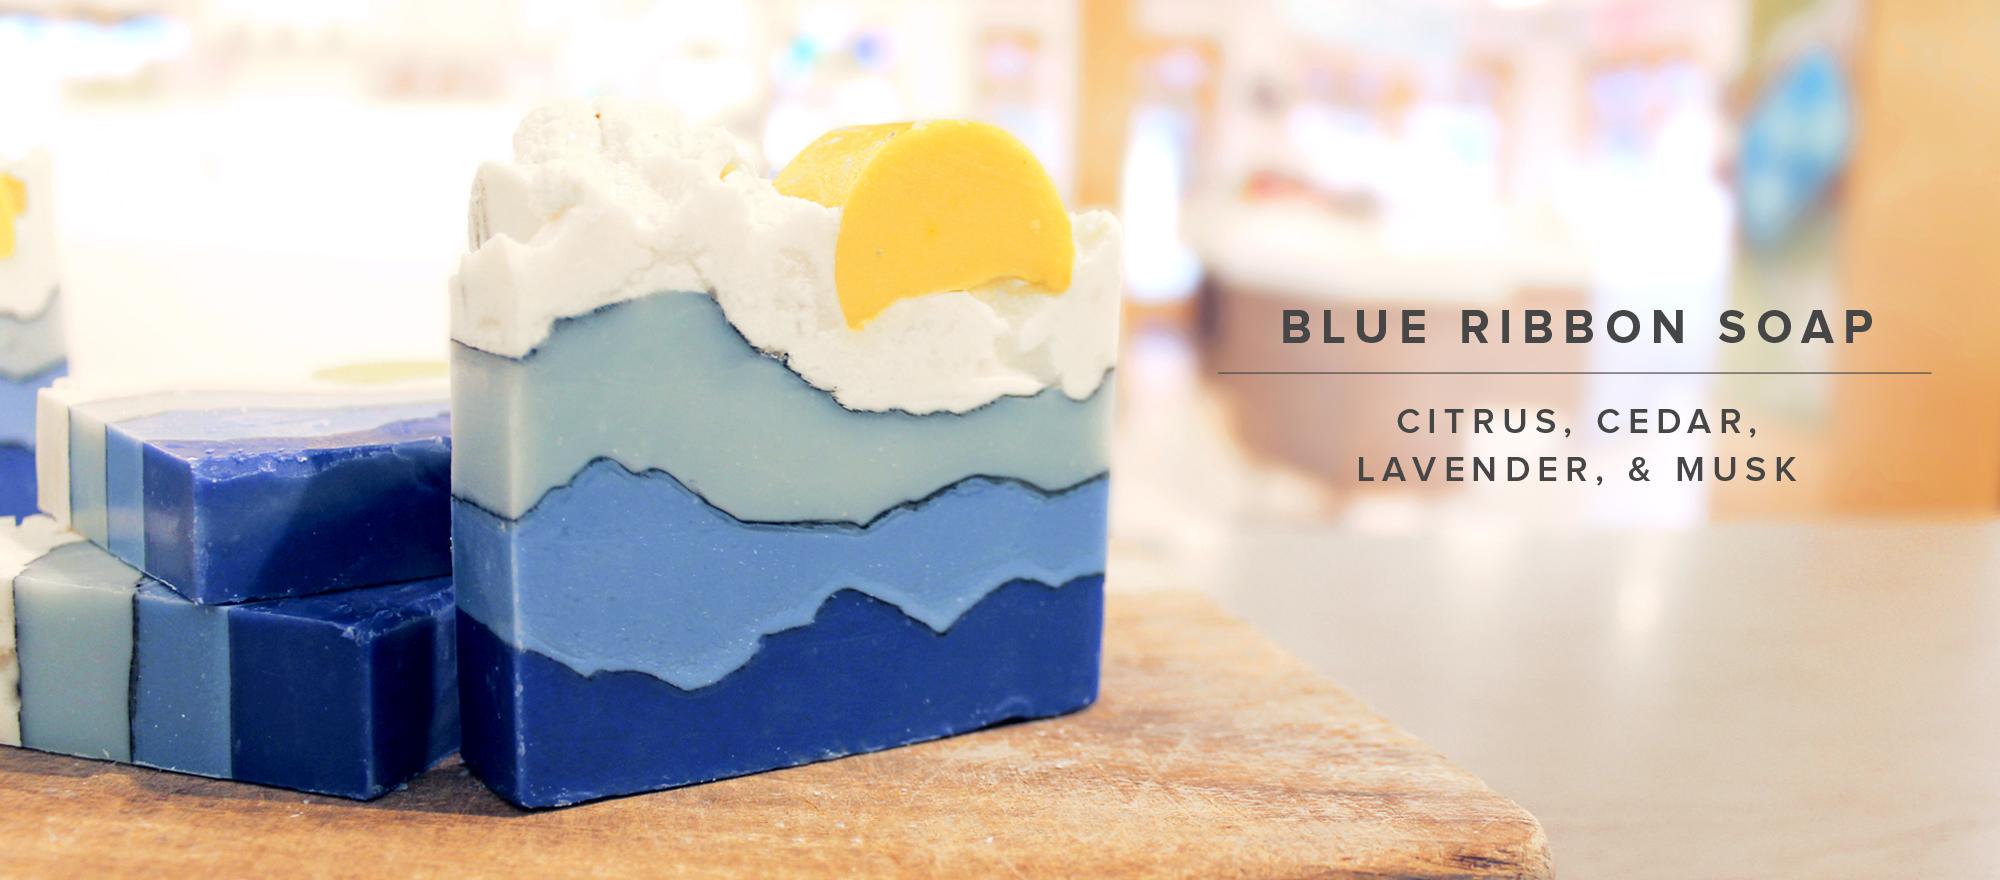 NEW Blue Ribbon Soap